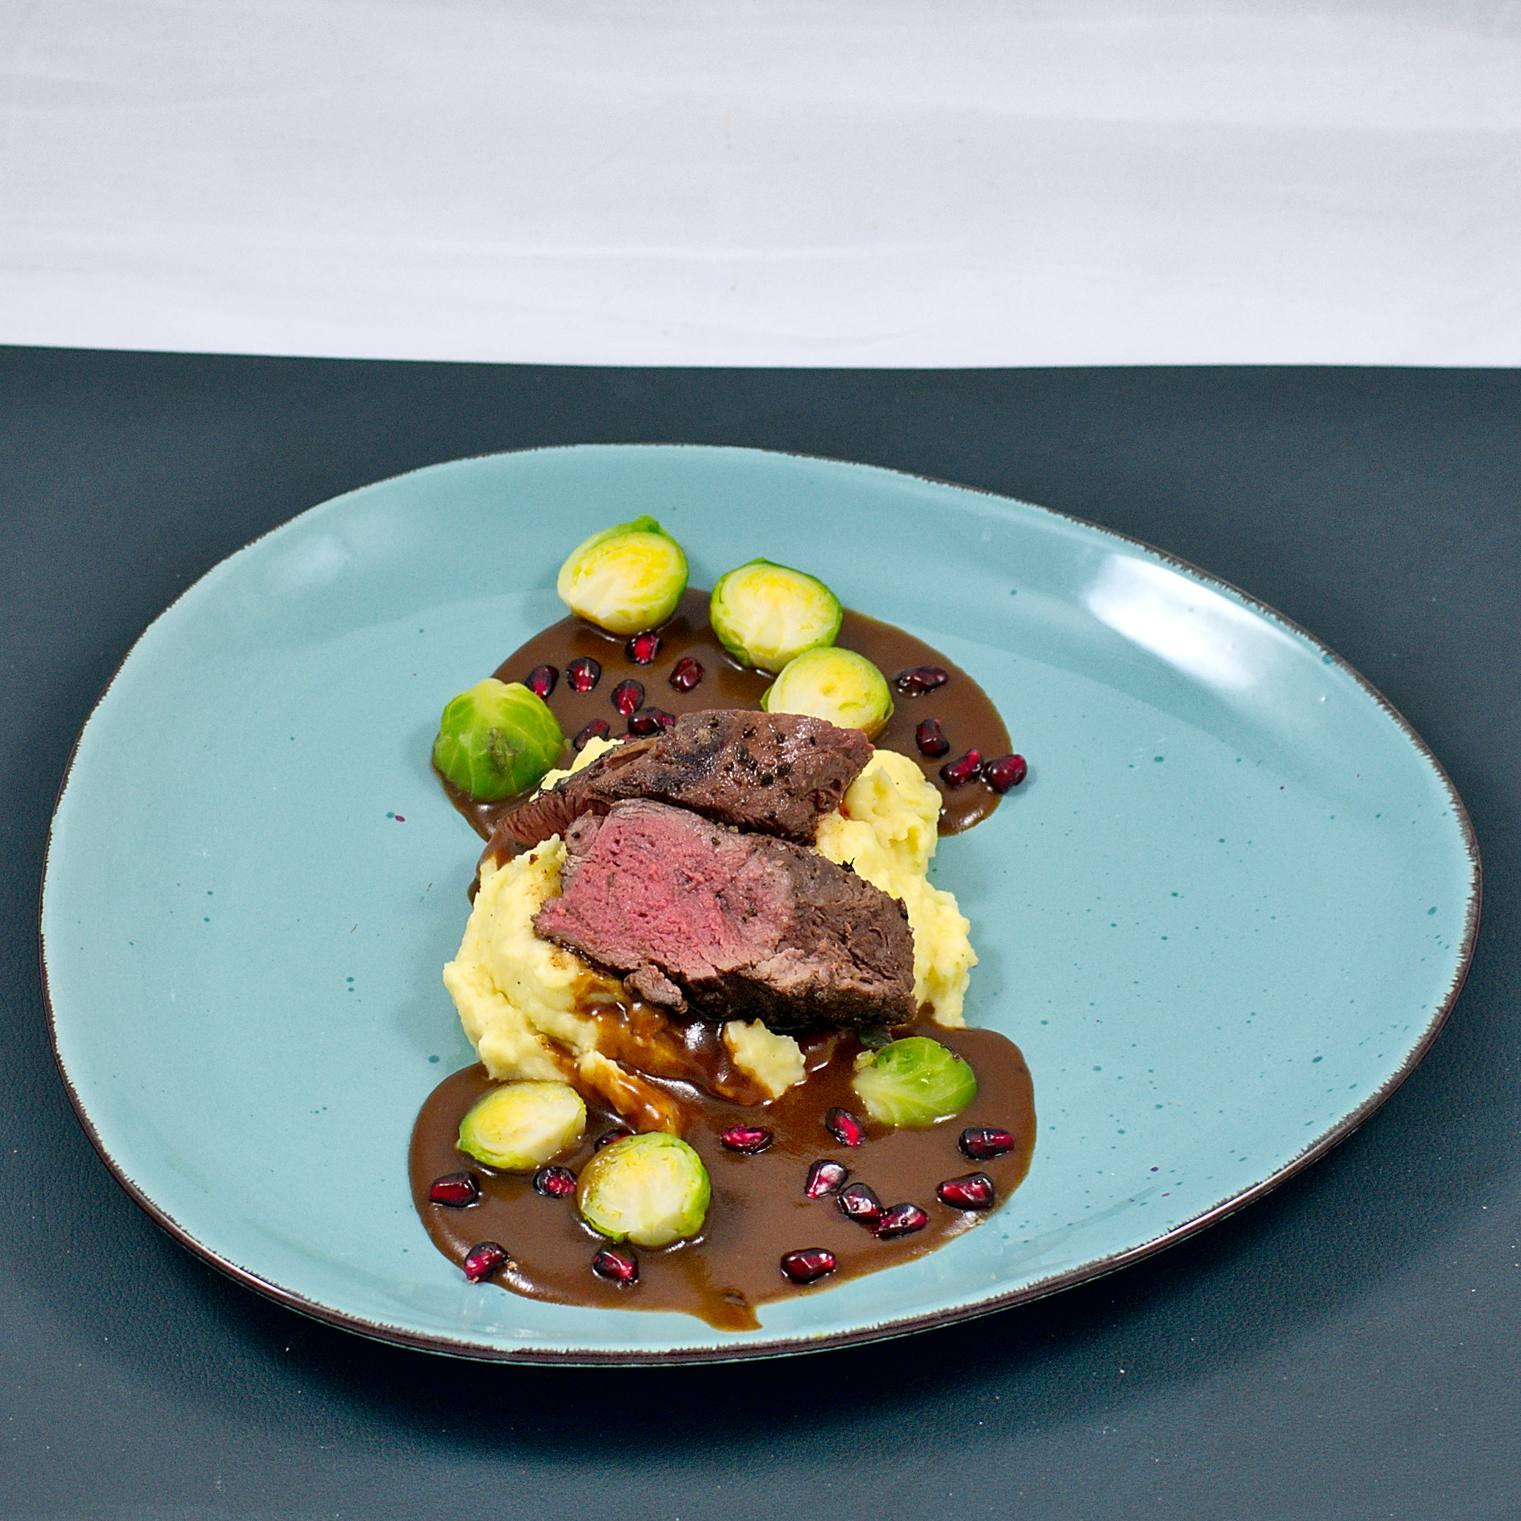 Rehrücken sous vide | Granatapfelsauce | Pastinaken-Püree | Rosenkohl